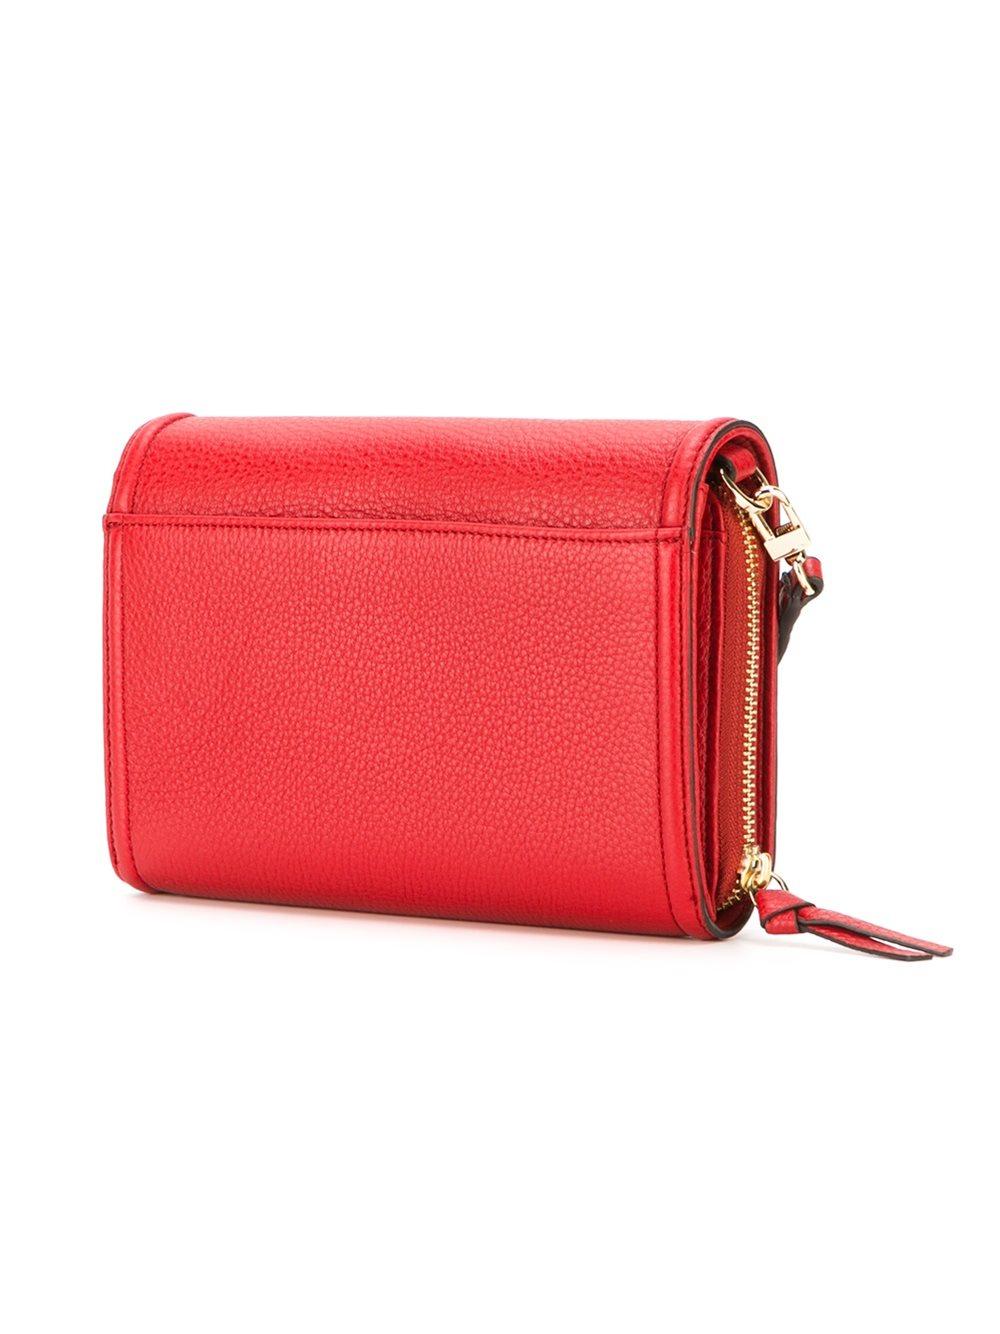 lyst tory burch foldover crossbody bag in red